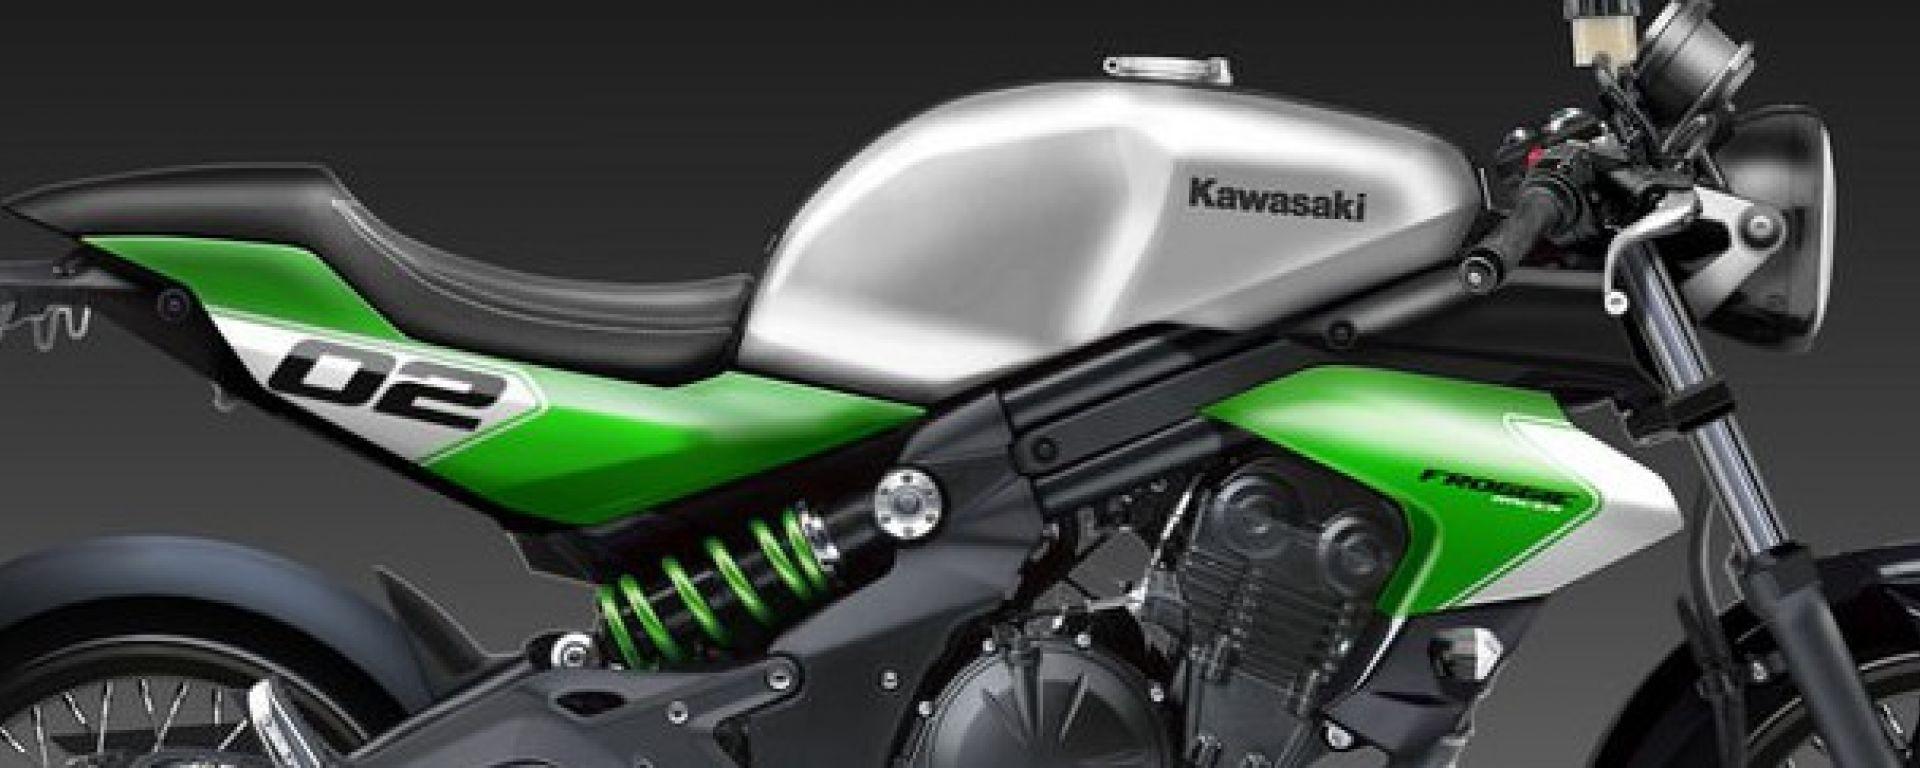 Kawasaki ER-6n Froggie e Koyote by Oberdan Bezzi